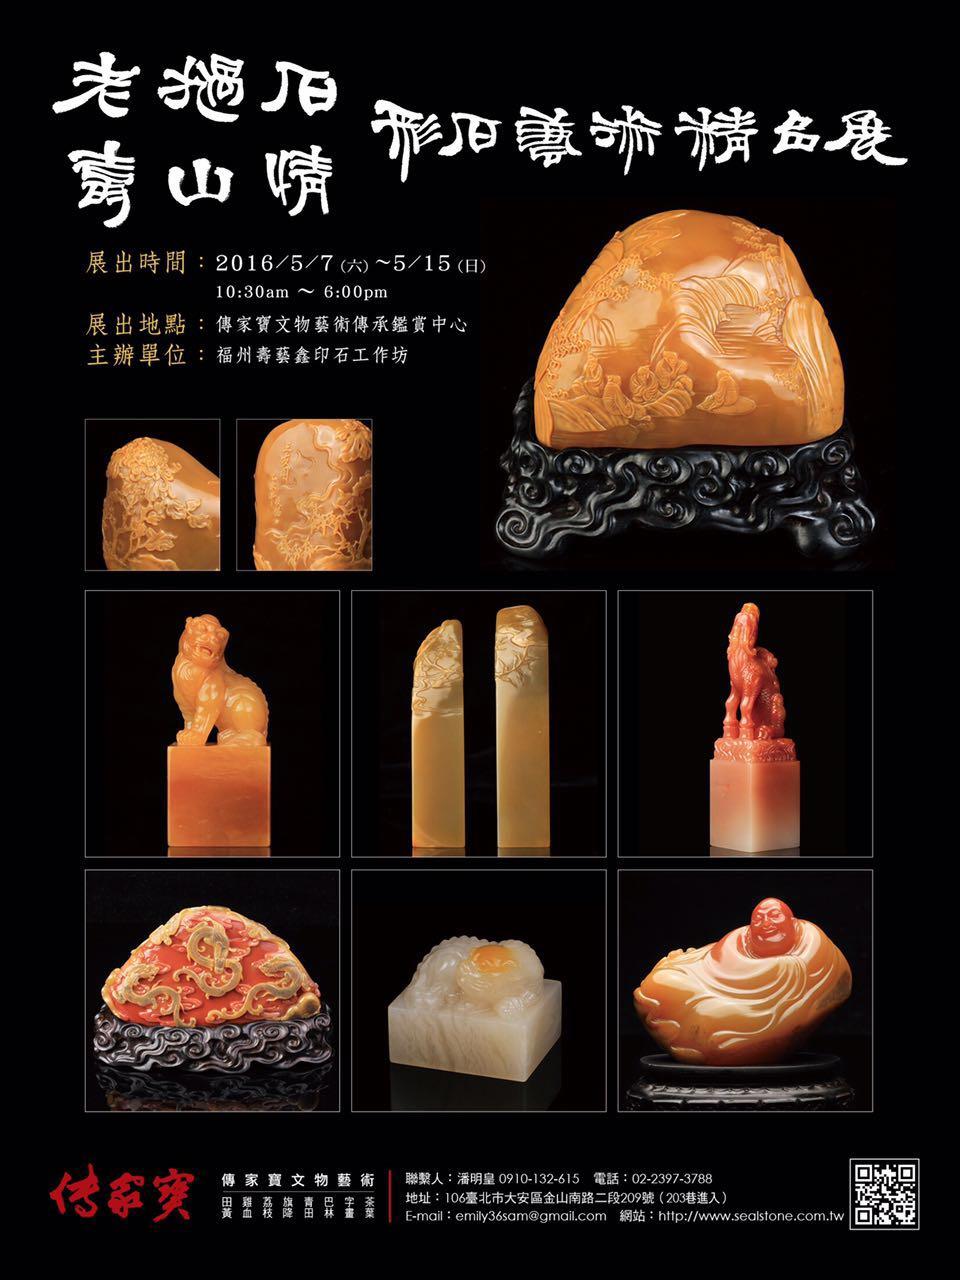 lao-jhua-stone-show-a-00